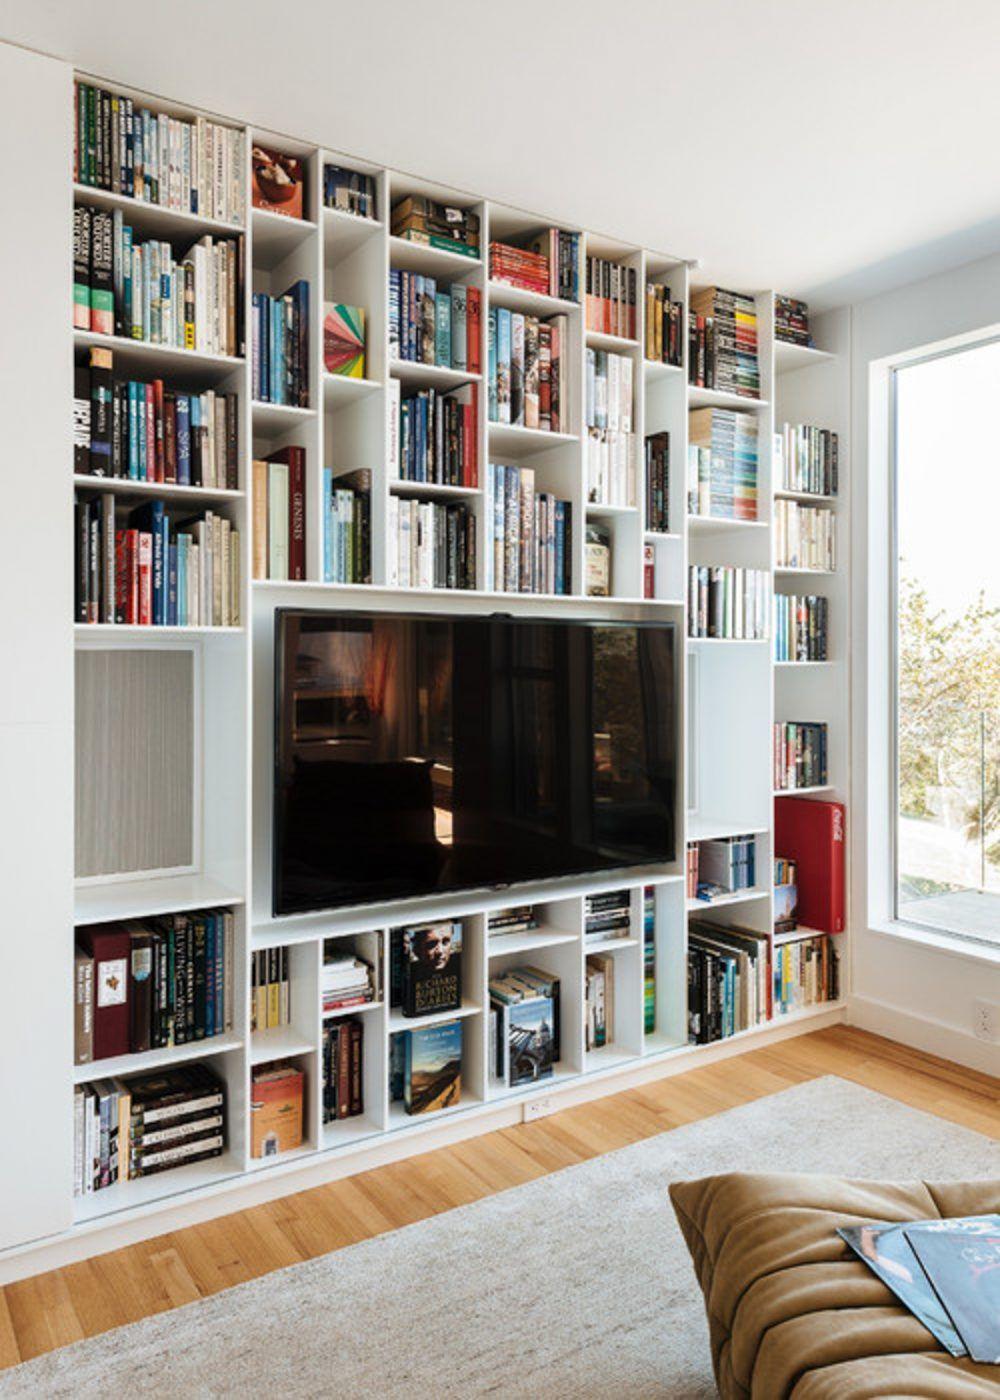 Cozy Reading Room Ideas 15 Creative Small Home Library Design